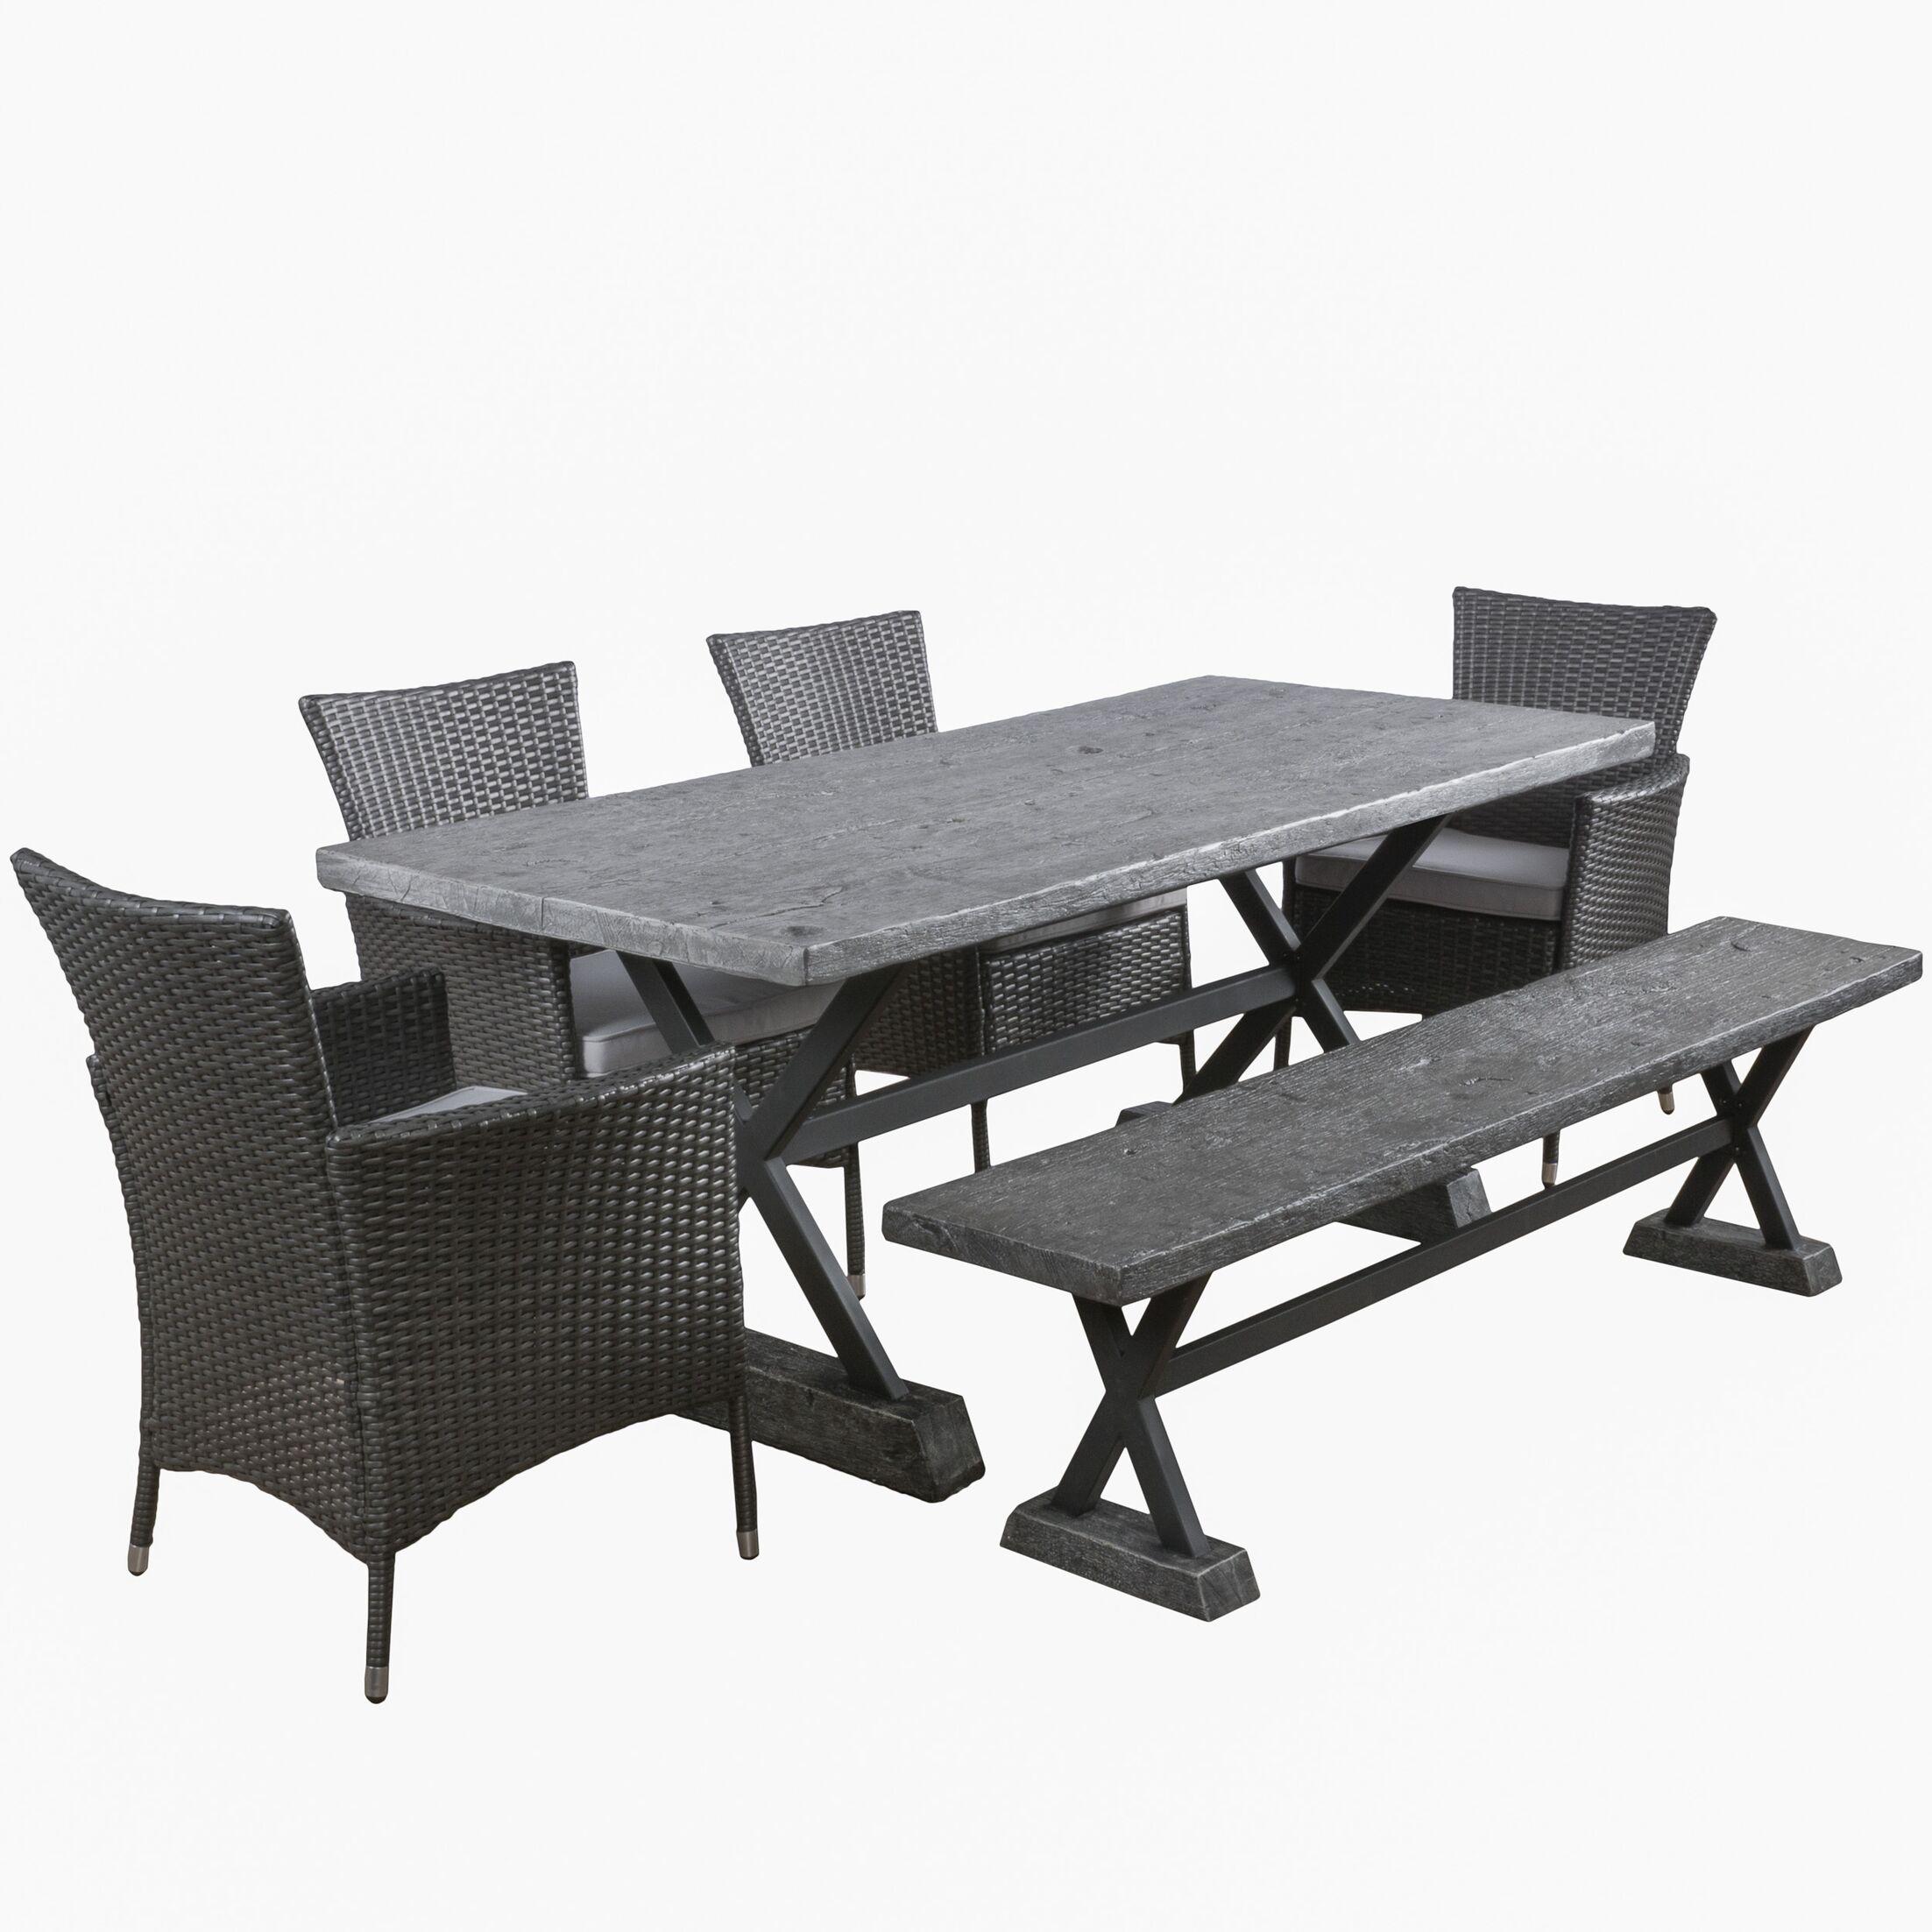 Blagnac 6 Piece Dining Set with Cushions Finish: Grey